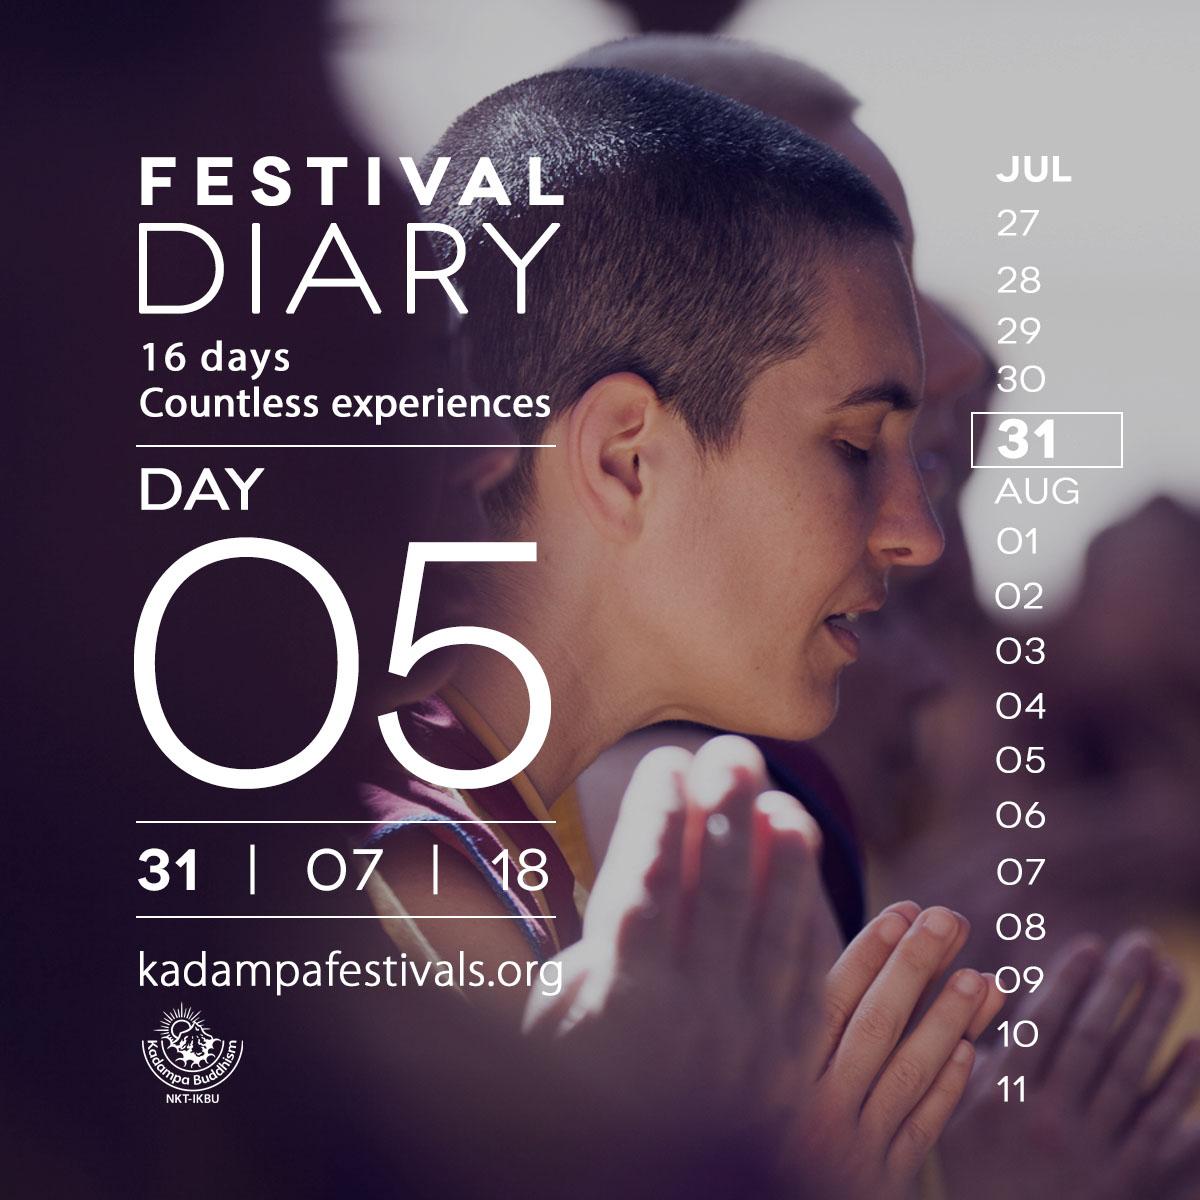 2018-07-26-festival diary-05-m